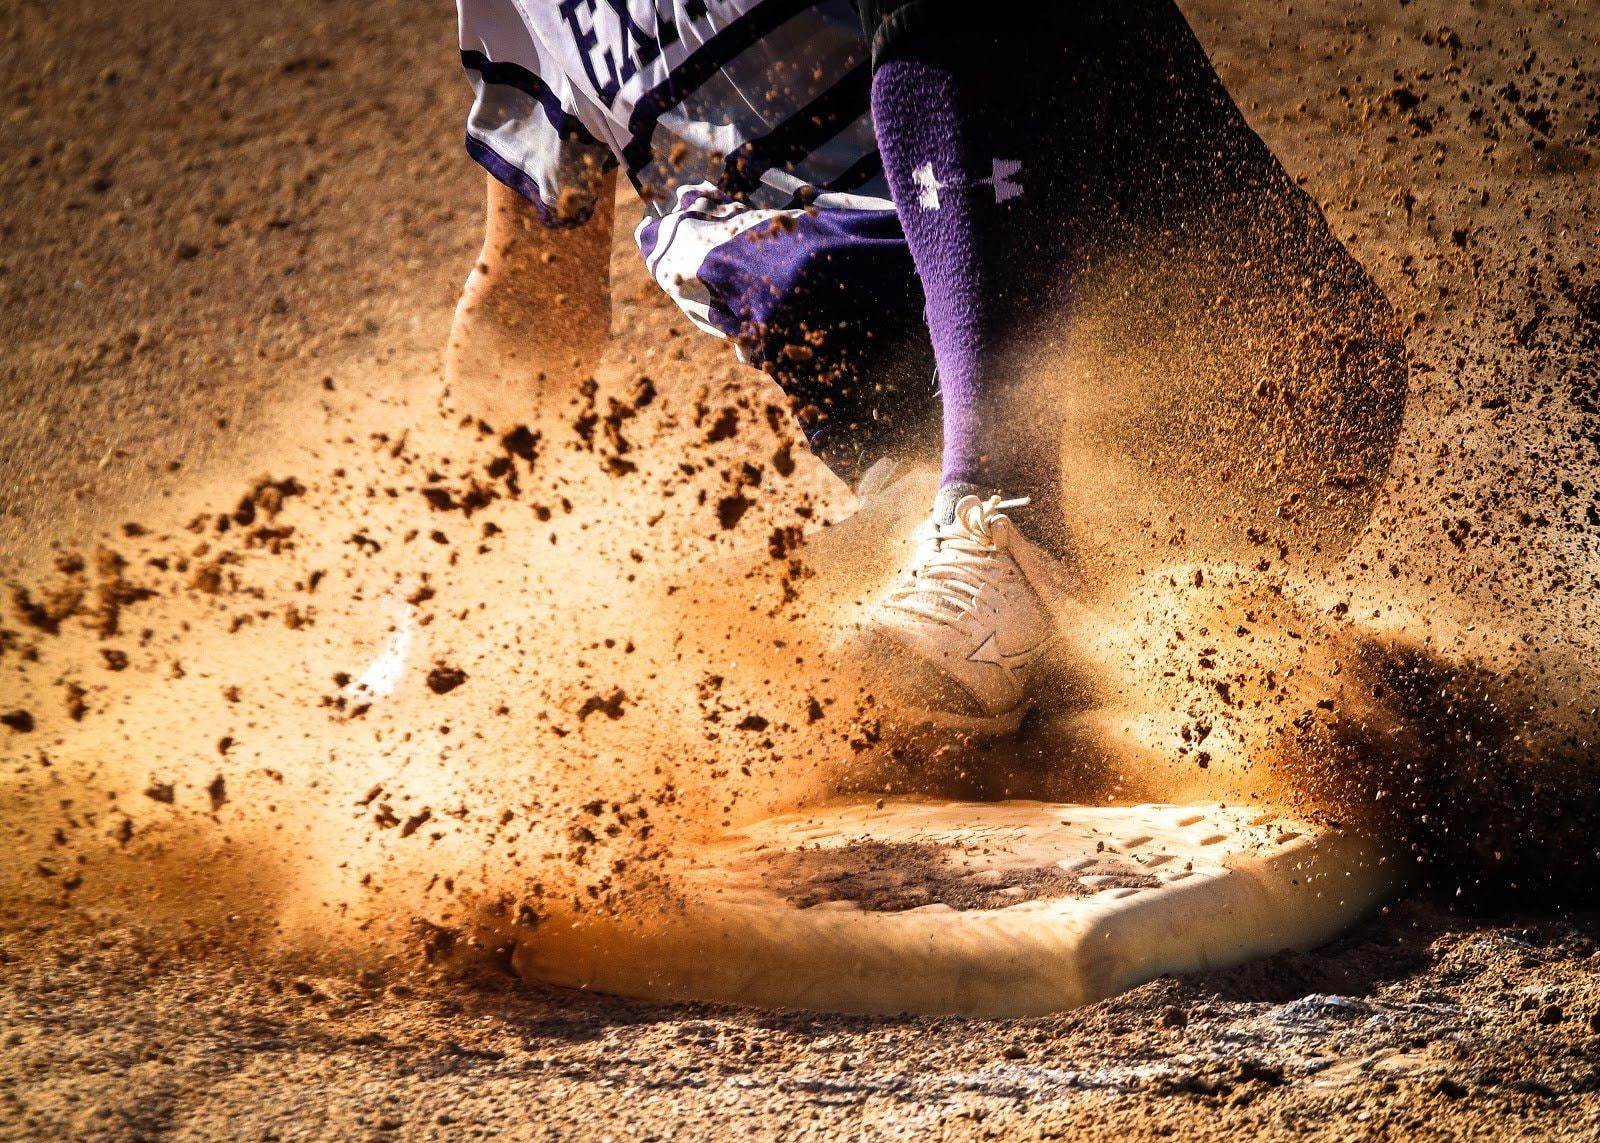 Closeup shot of a baseball player sliding into base by Brandon Mowinkel